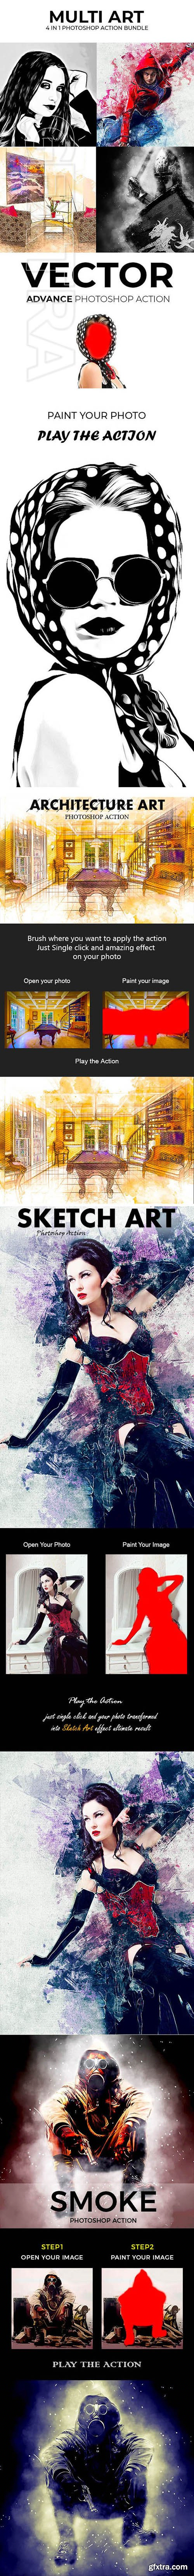 GraphicRiver - Multi Art 4 in 1 Photoshop Action Bundle 22921554